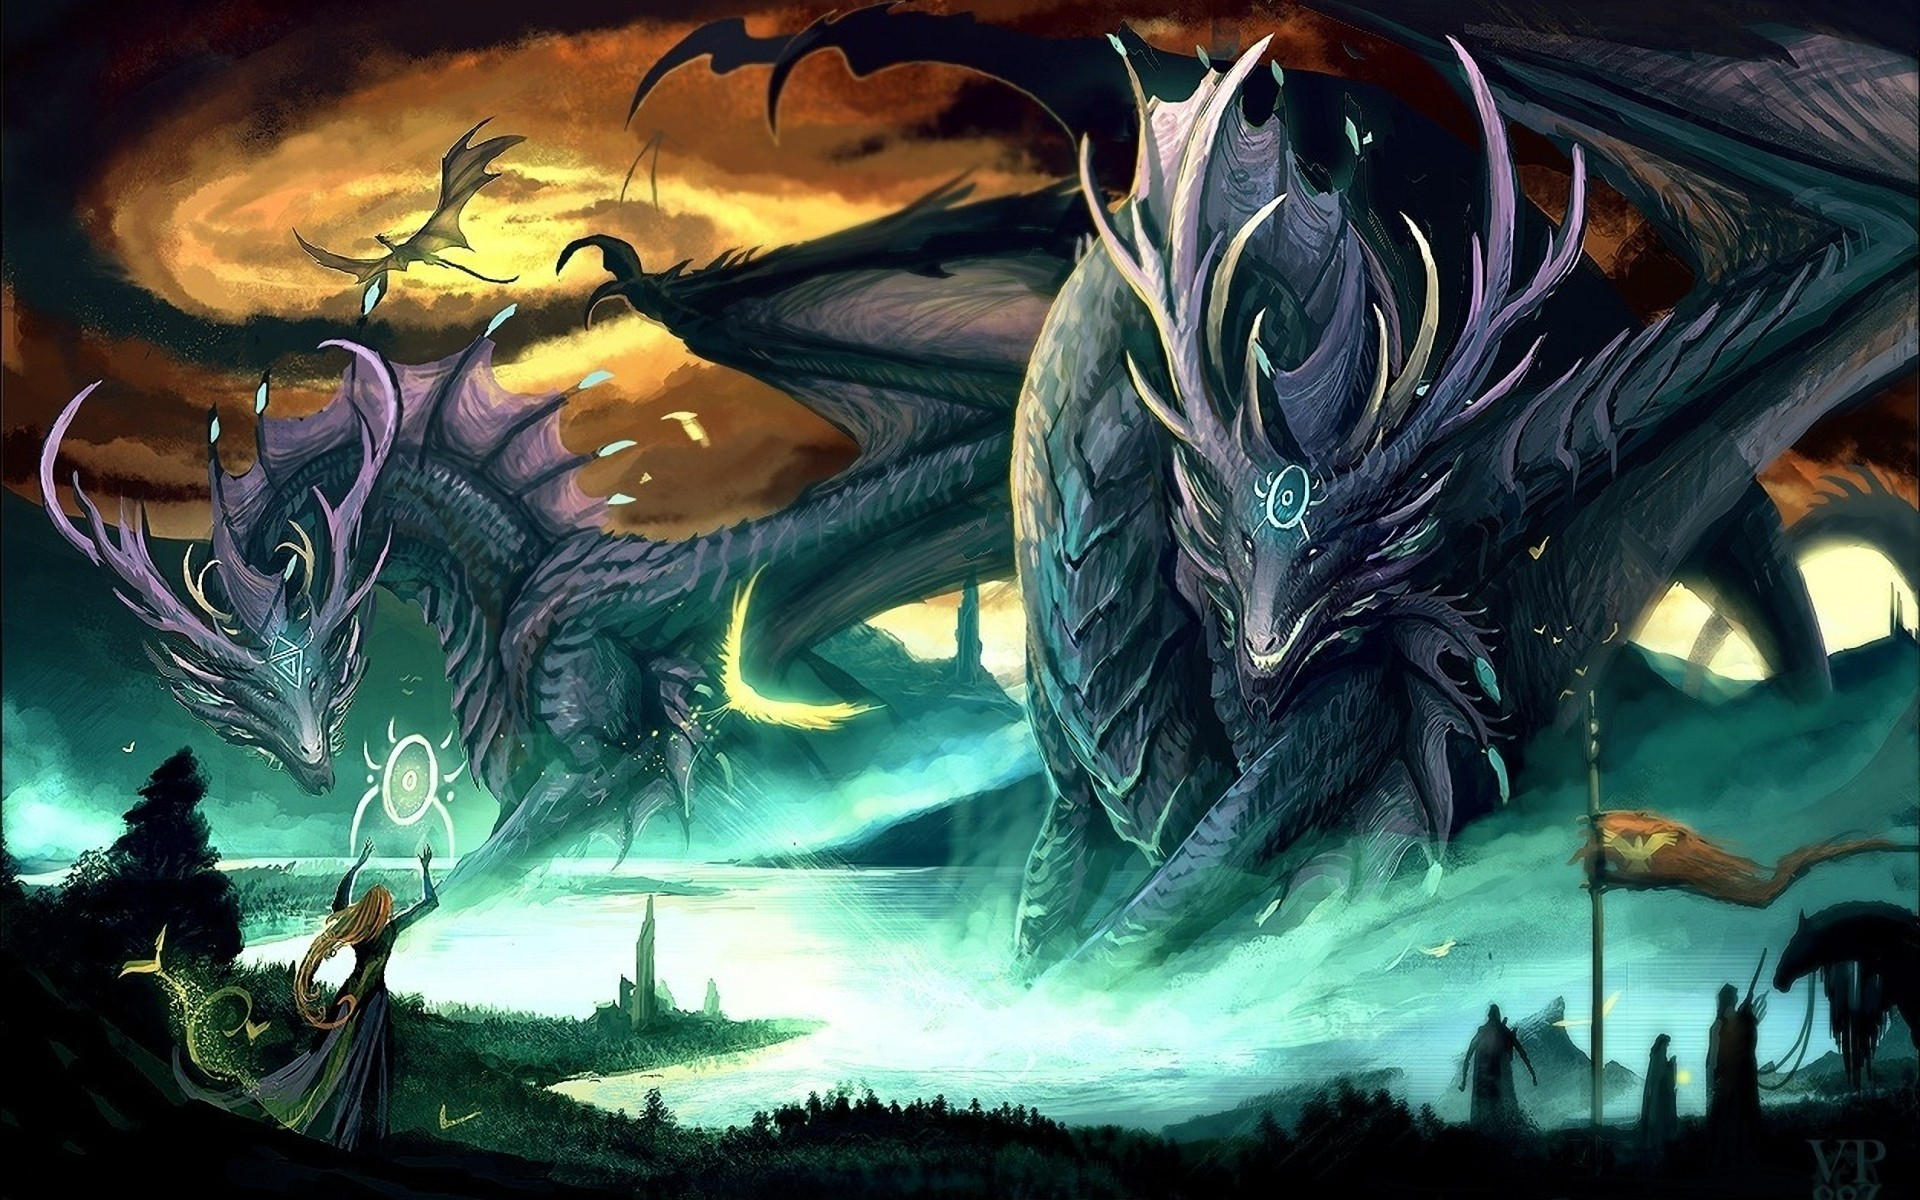 fantasy art creatures wallpaper 1920x1200 15754 WallpaperUP 1920x1200